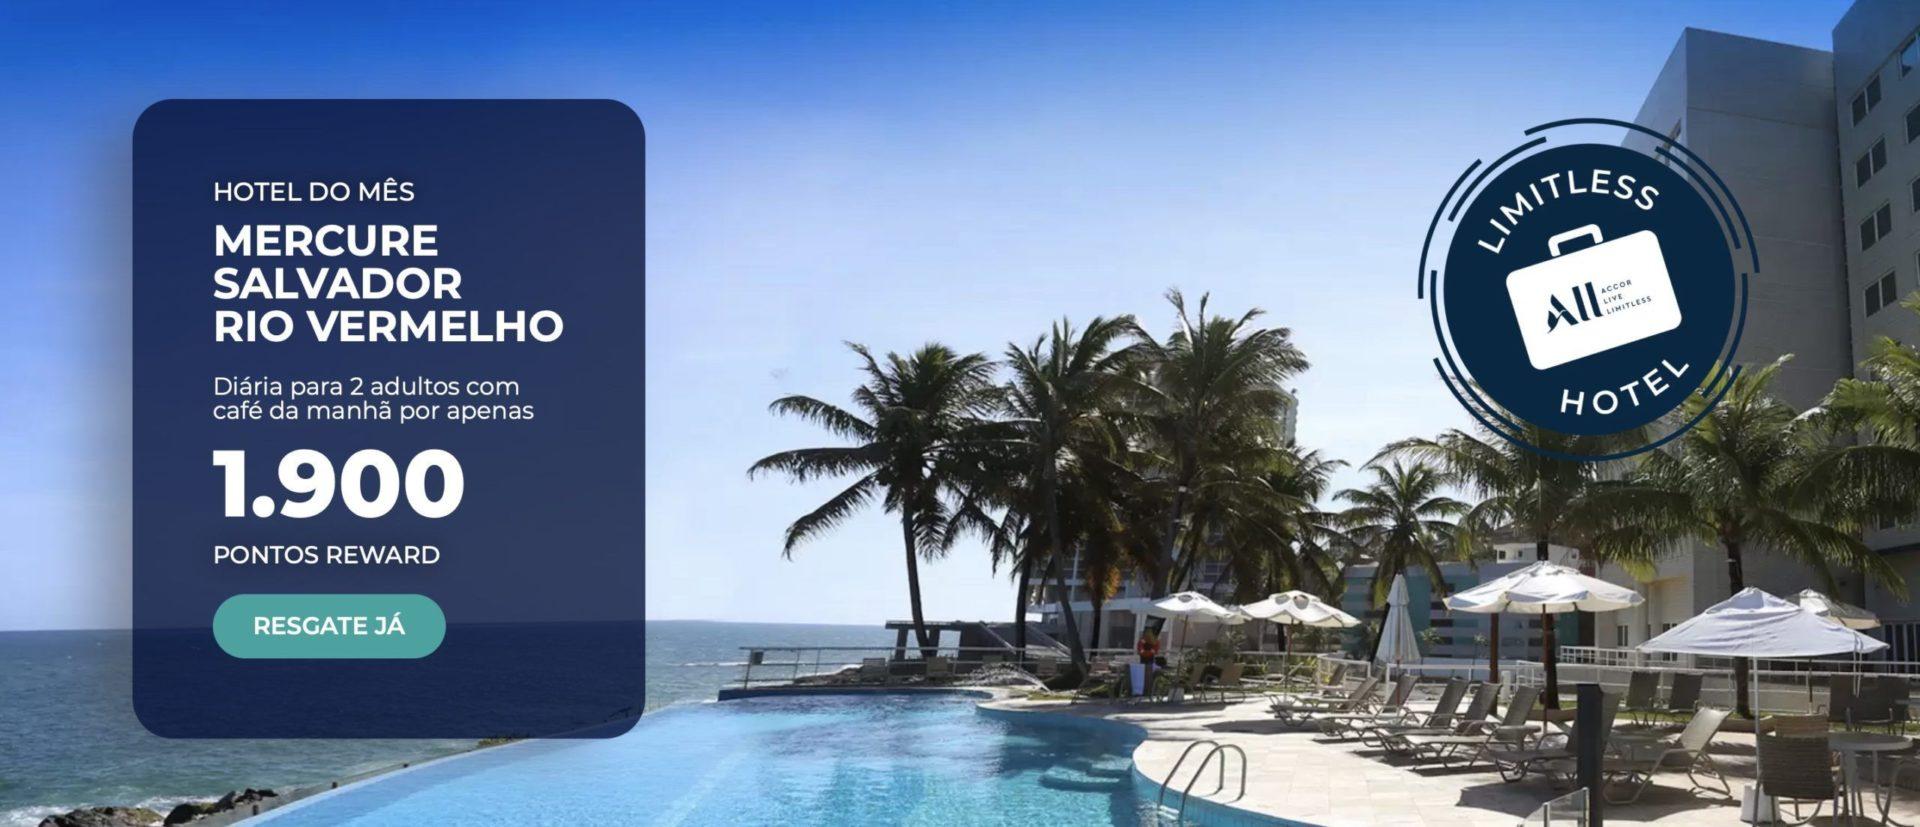 Limitless Hotel Mercure Salvador